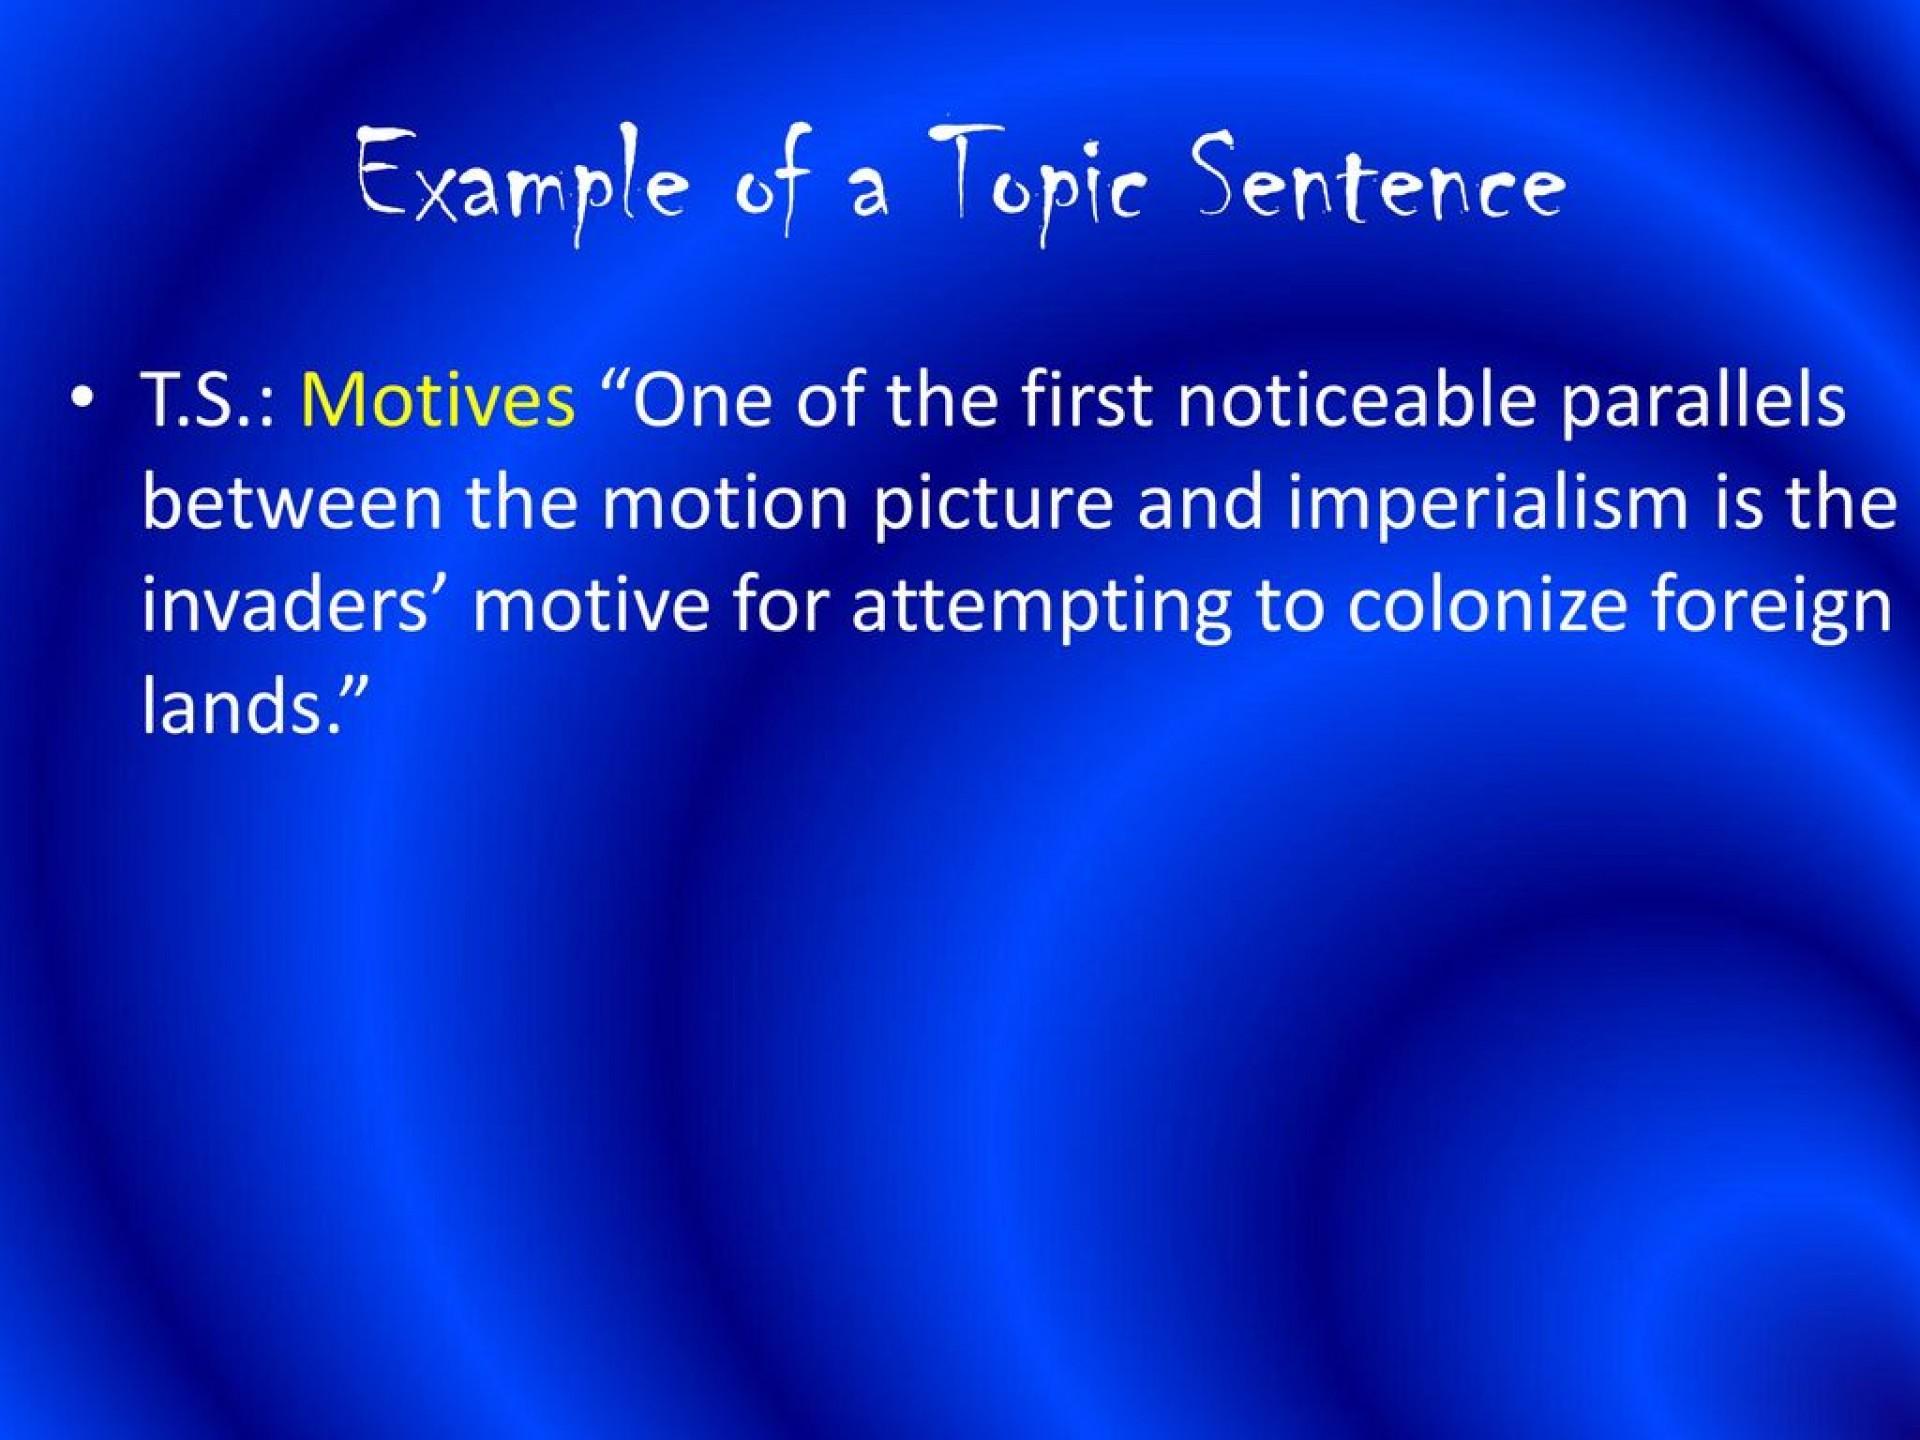 007 Exampleofatopicsentence Avatar Imperialism Essay Stirring 1920